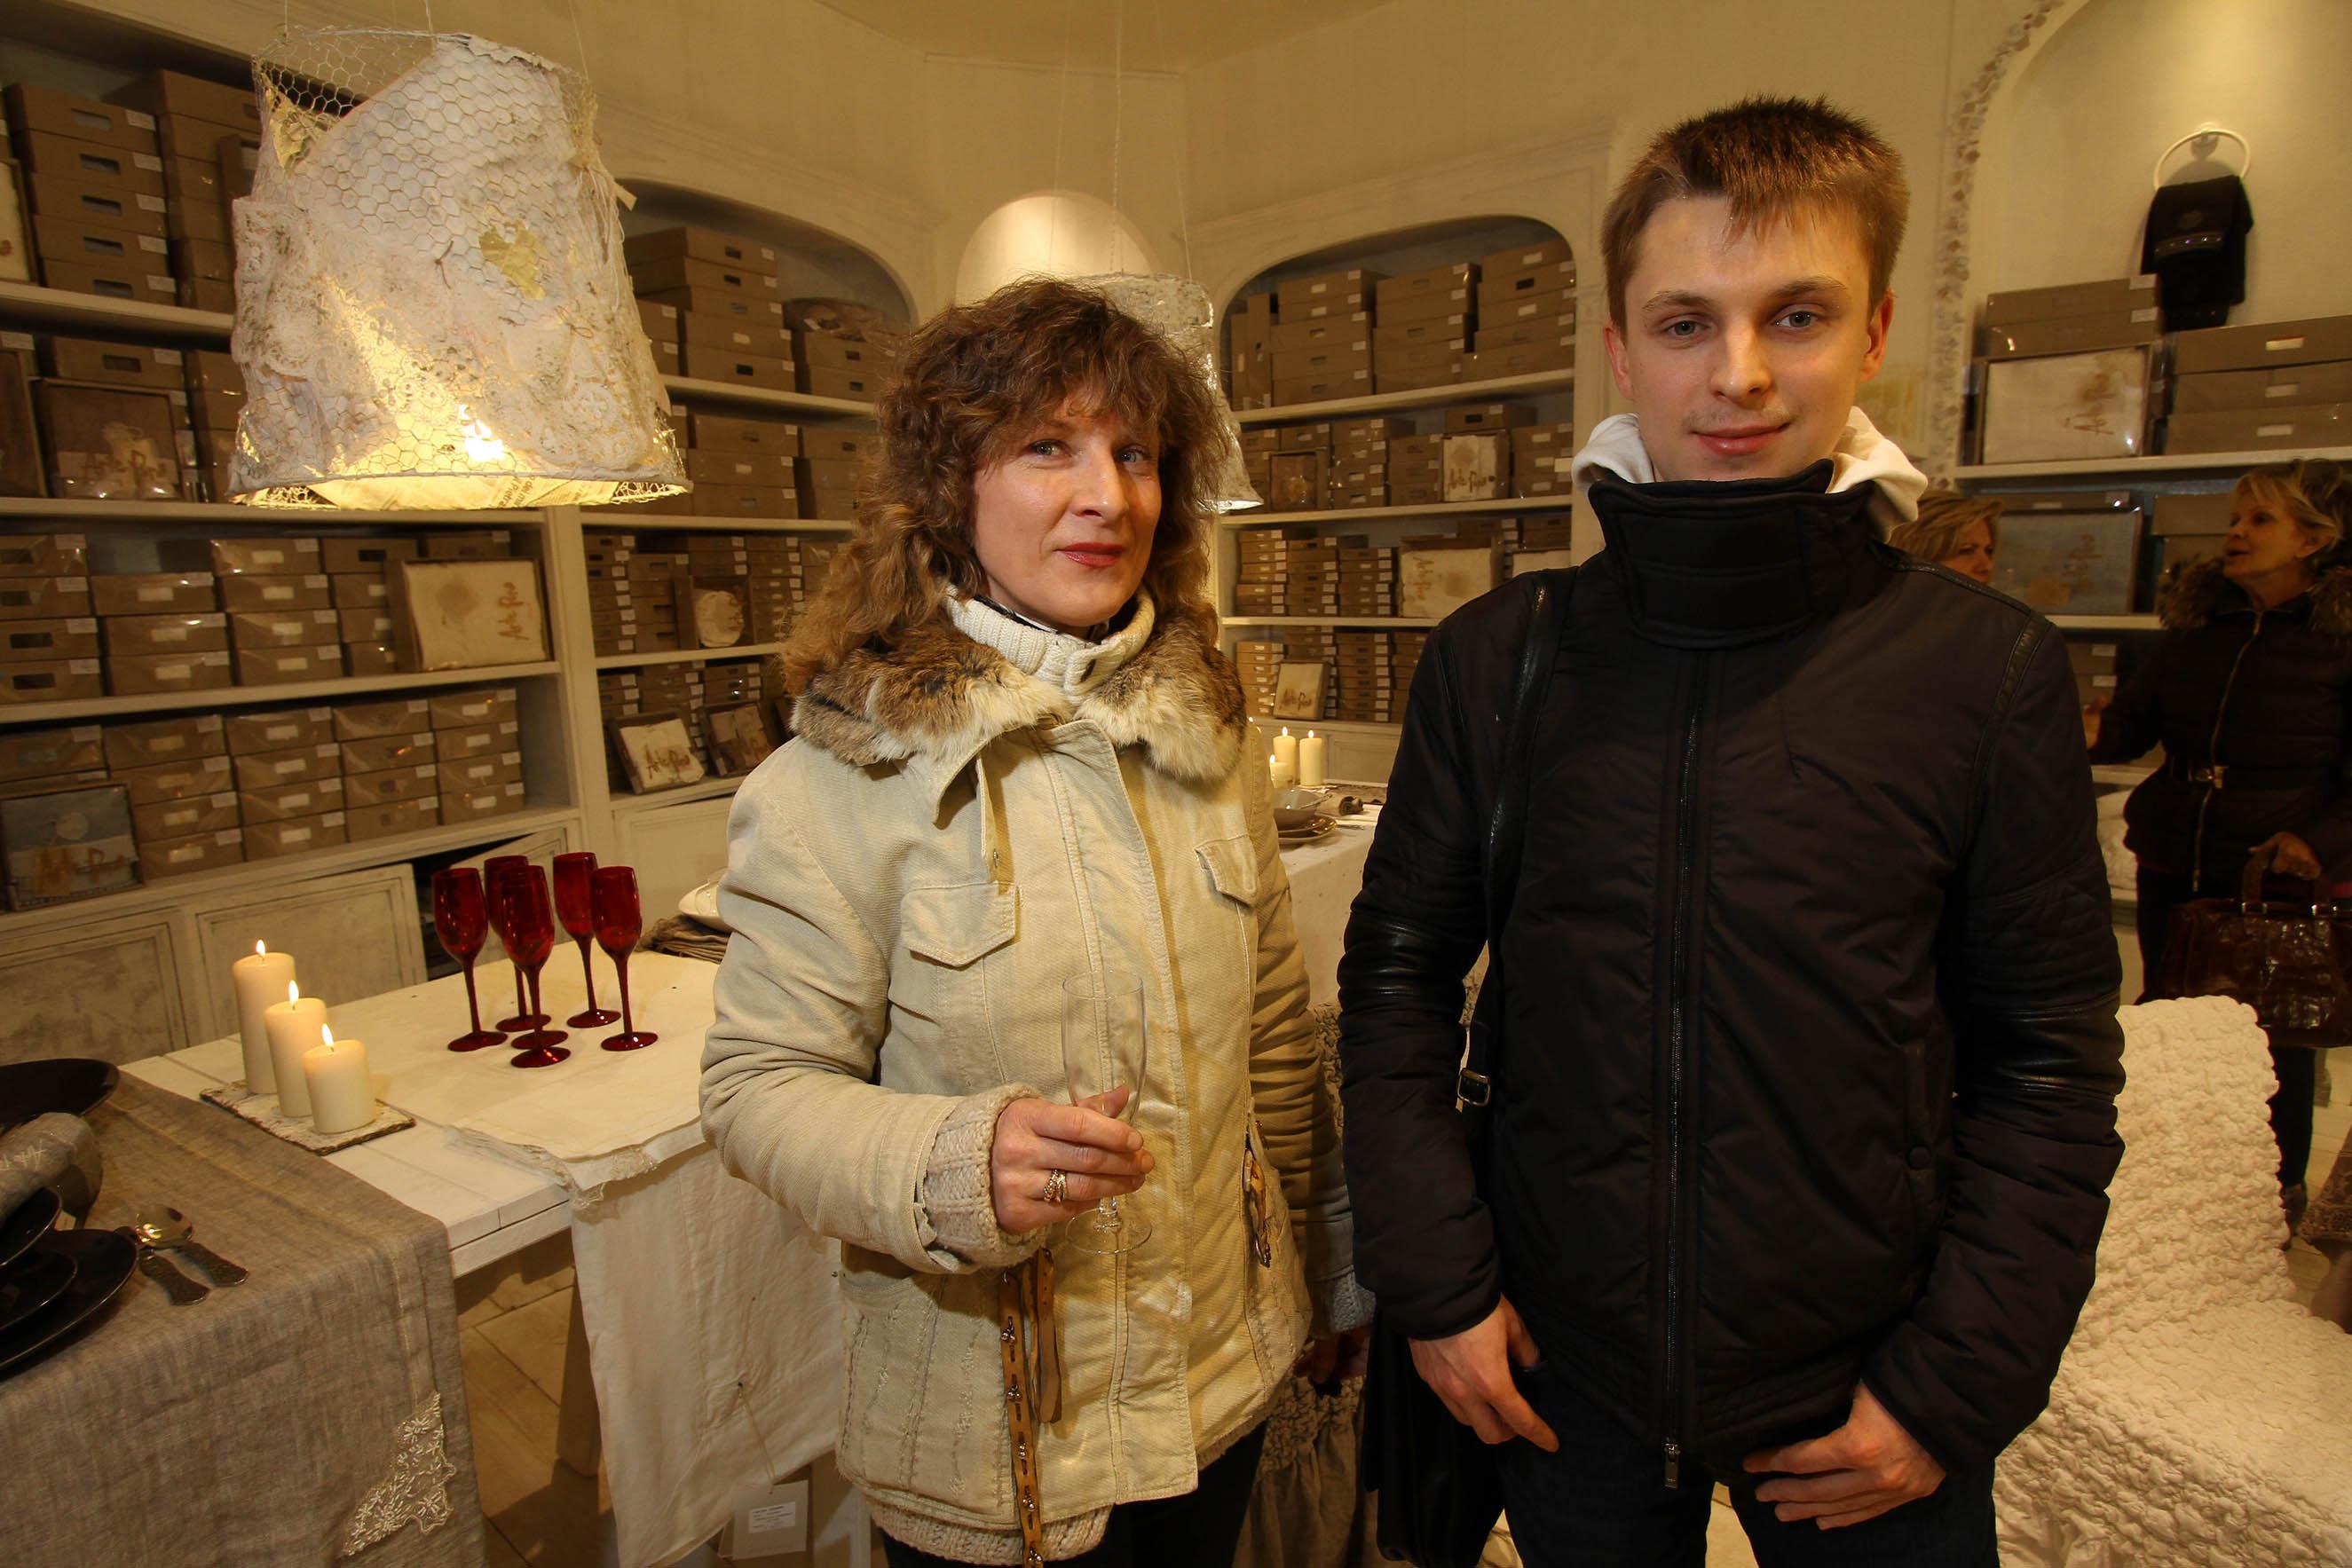 PRESSPHOTO Firenze, La Galleria. Nella foto Yaroslav Sudarushkin e Galina Kravchenko